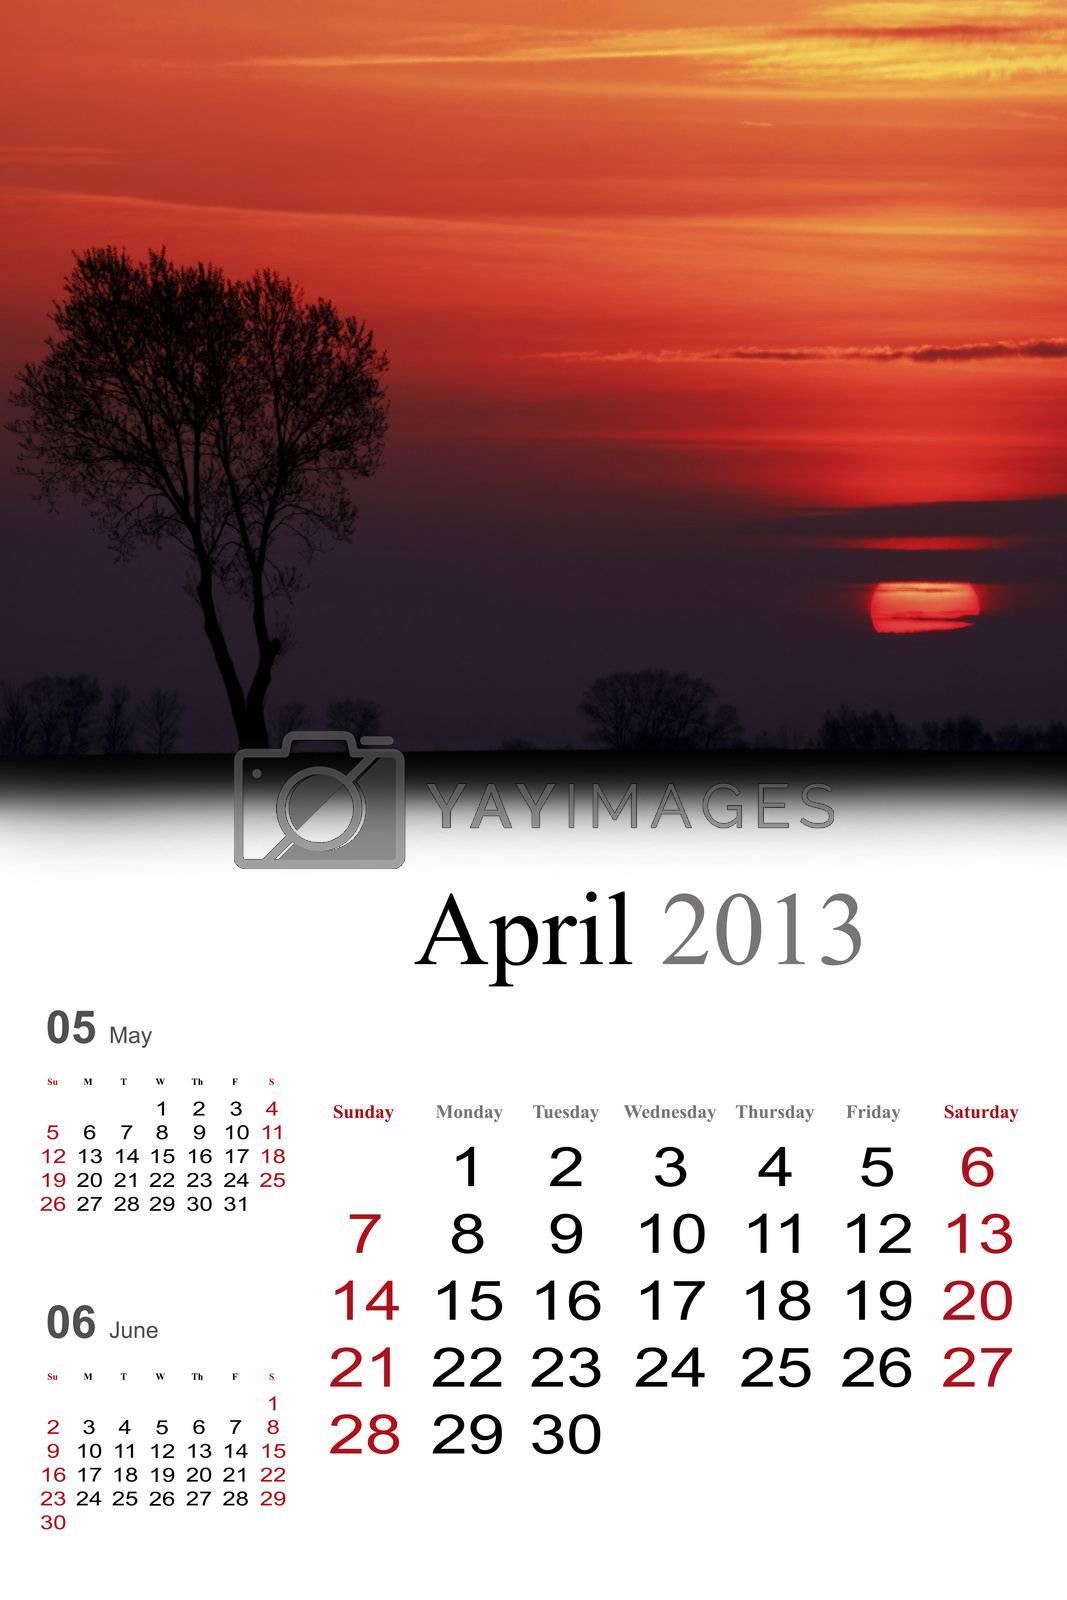 2013 Calendar.April